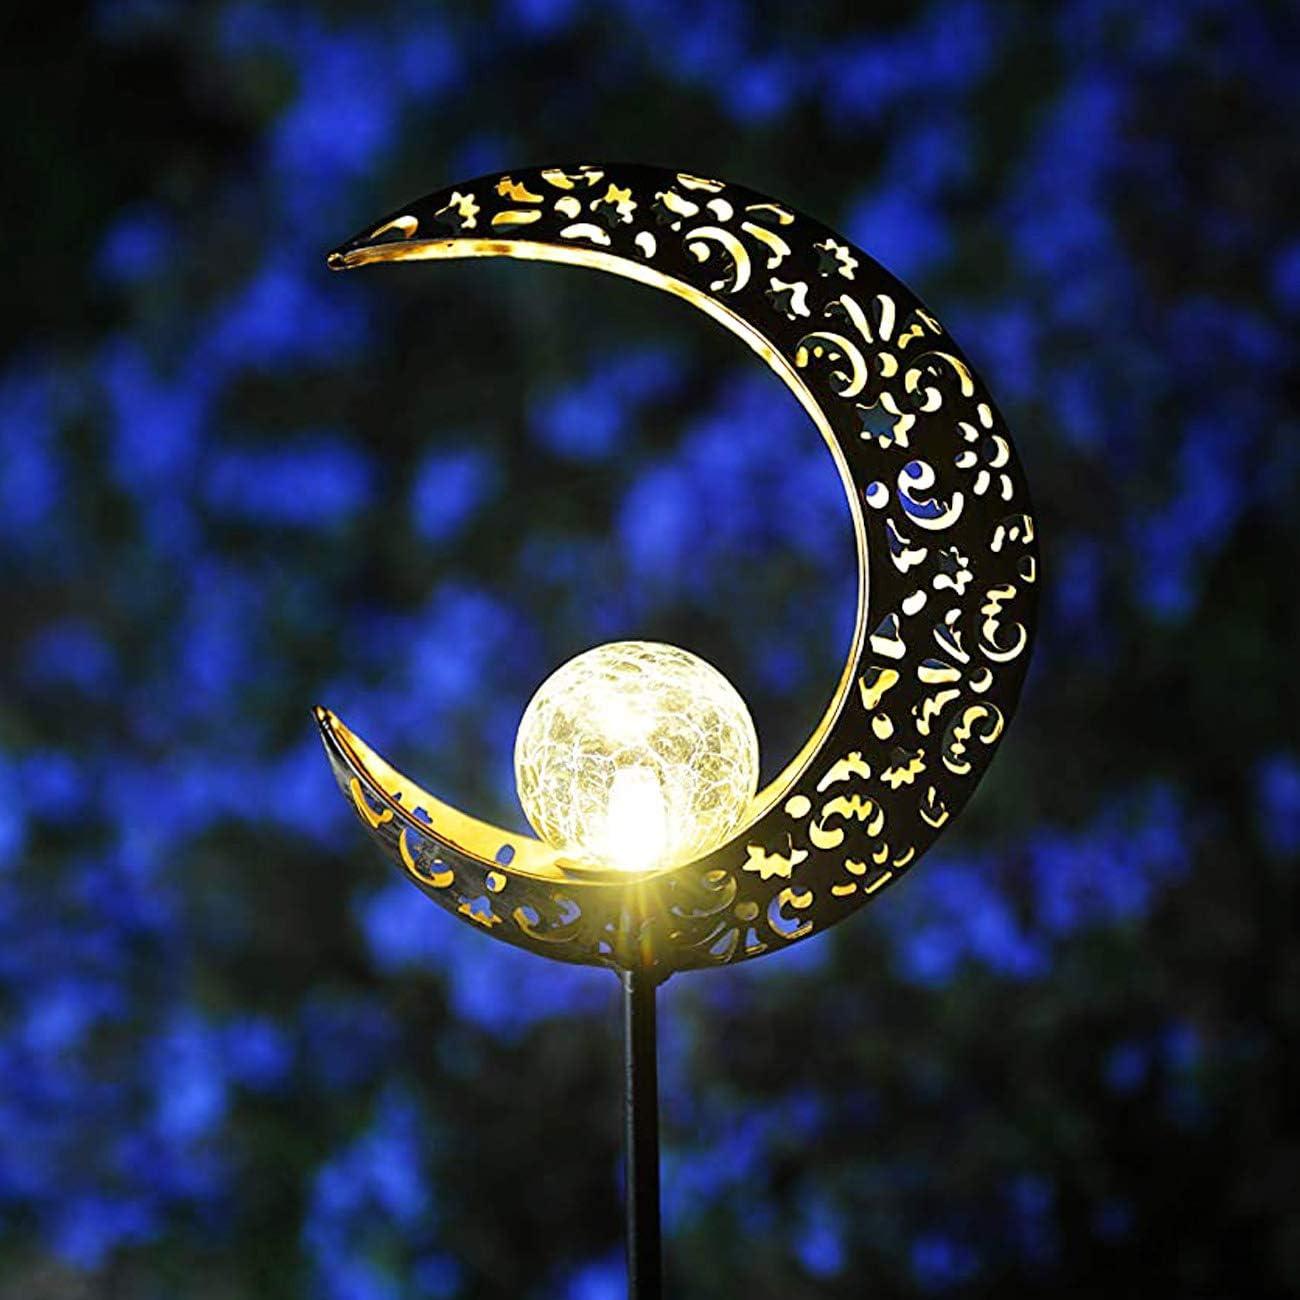 GLAM HOBBY Garden Solar Light Outdoor Decorative, Waterproof Moon Decor Light, Crackle Glass Ball Metal Garden Stake Light for Pathway, Lawn, Patio, Yard (Moon)